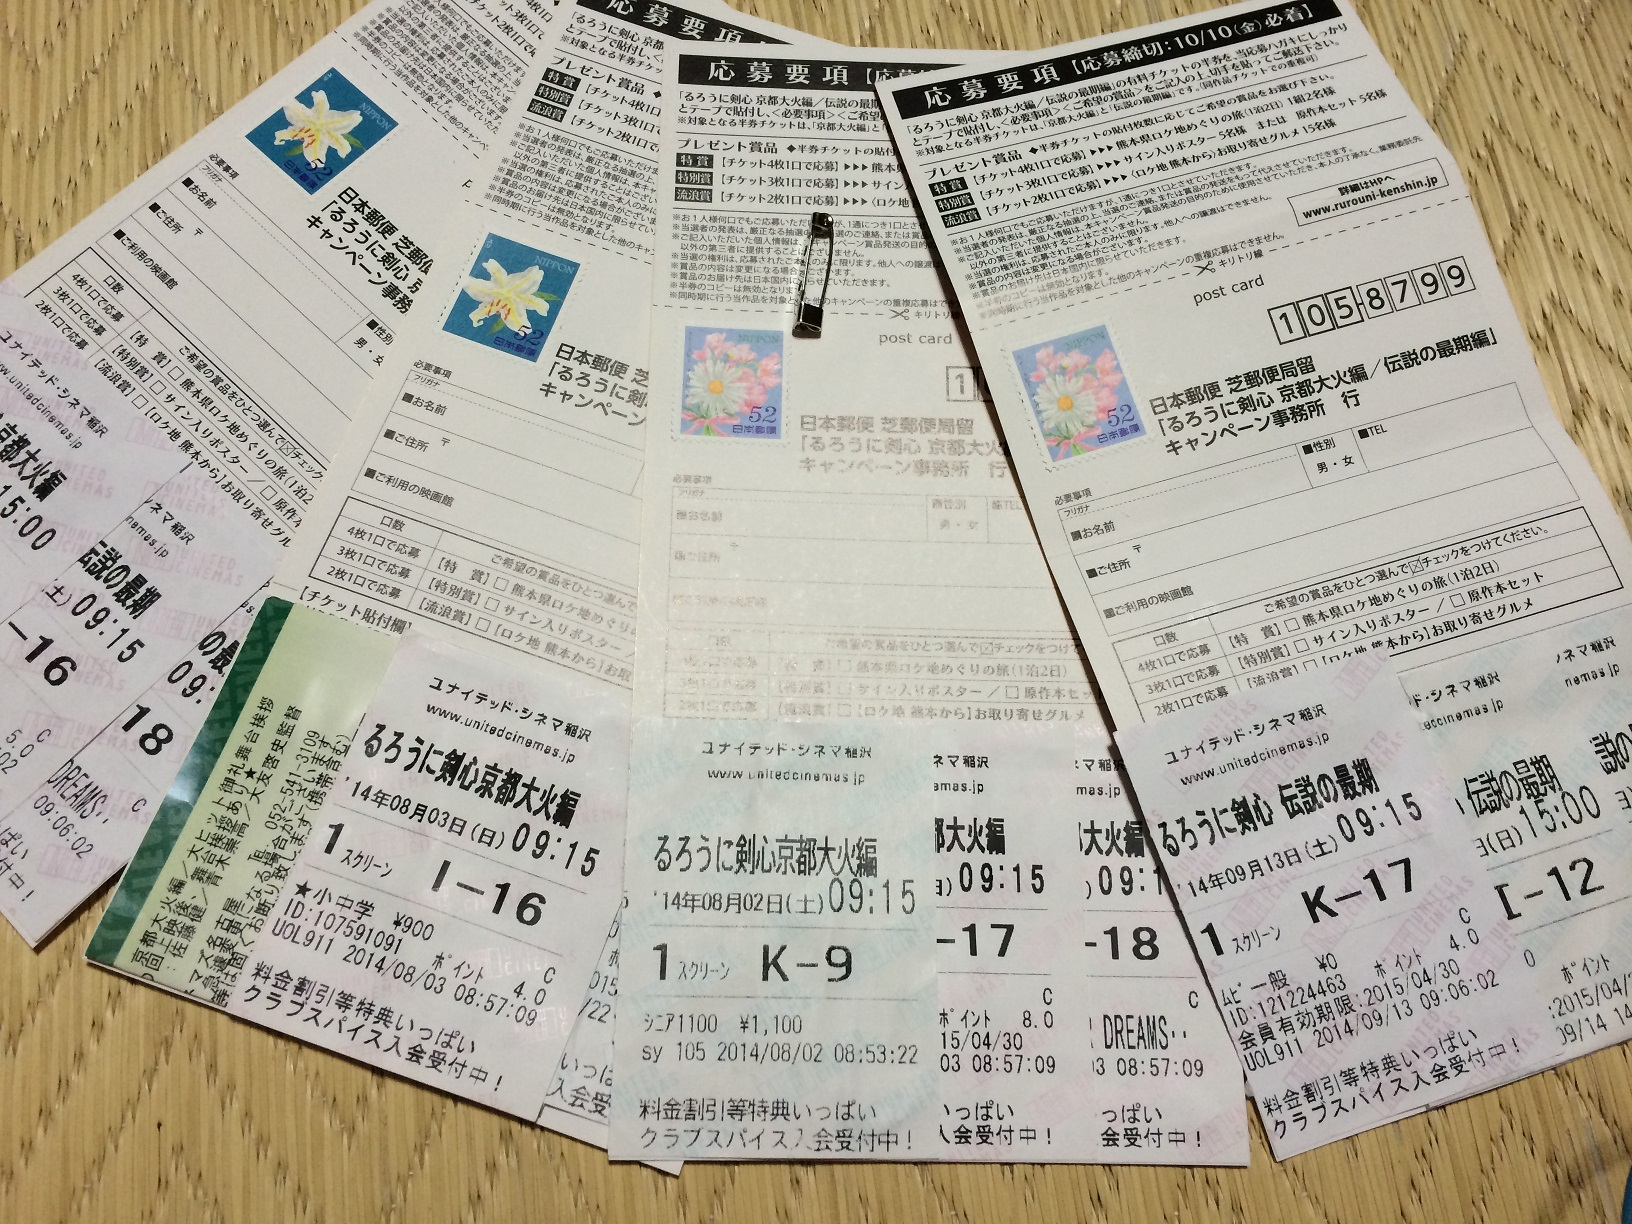 2014-09-29 23.16.53